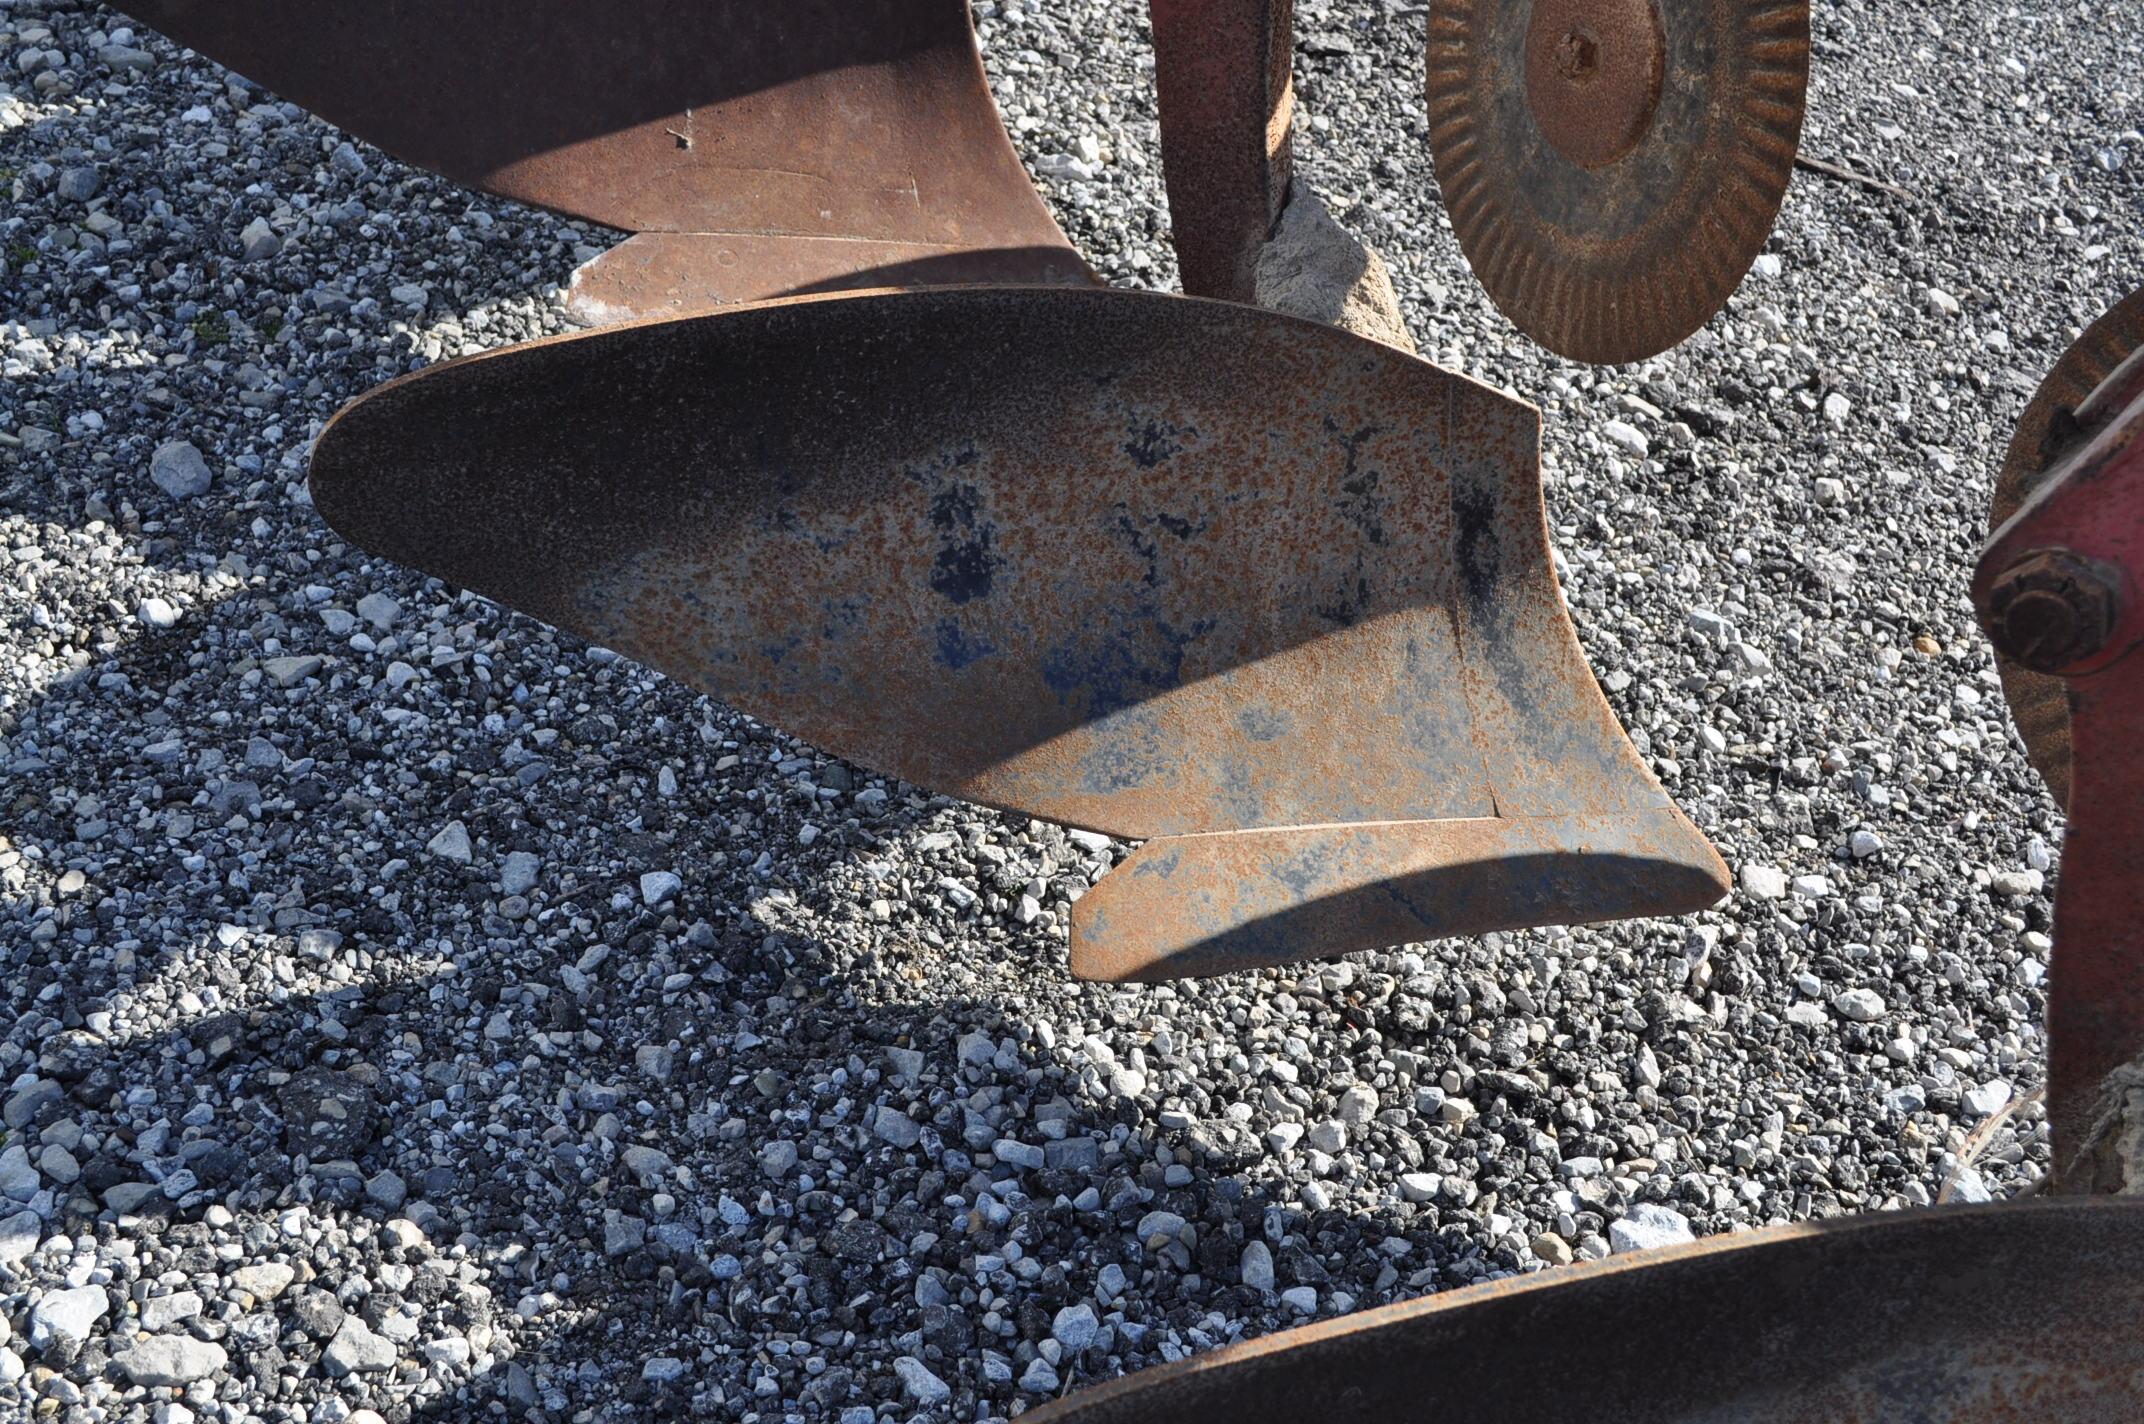 International 700 onland moldboard plow, 7 btm, auto reset trip - Image 13 of 16